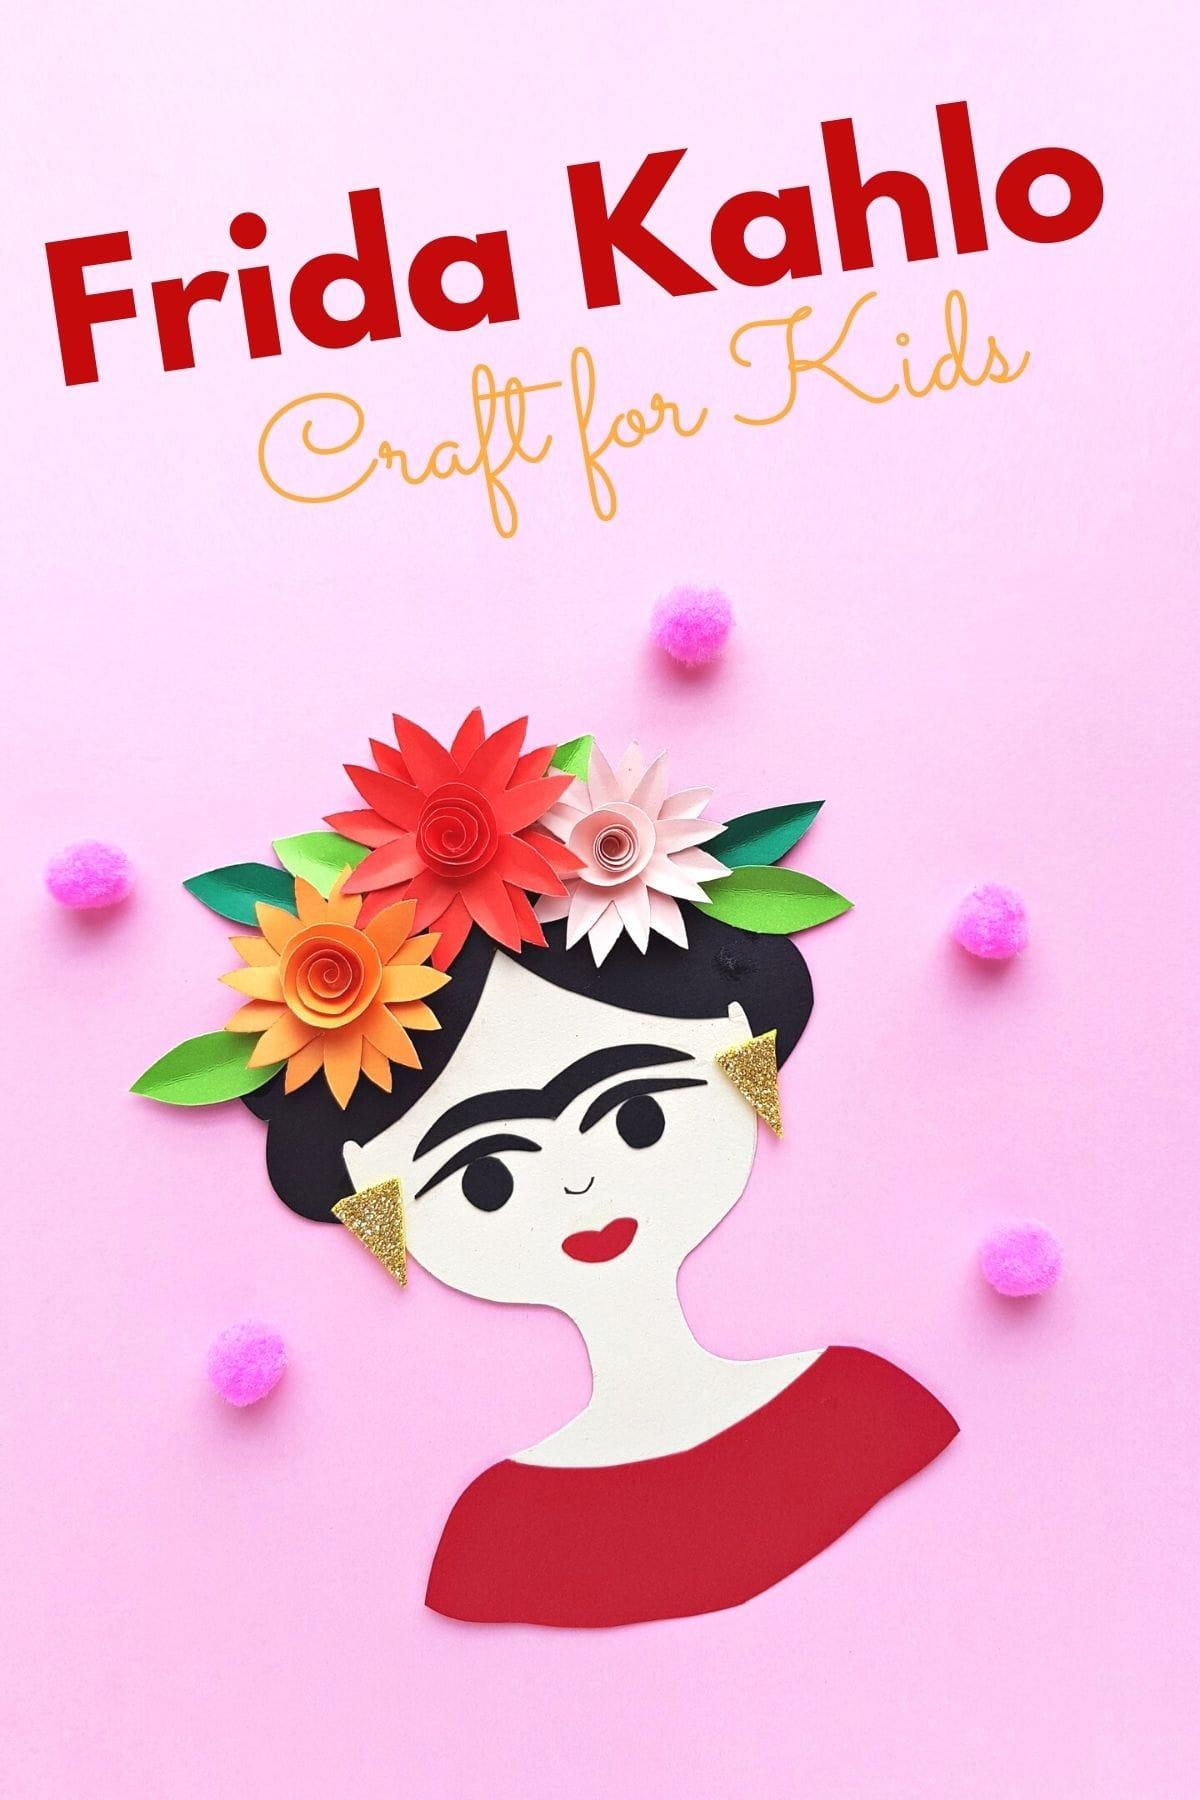 Frida Kahlo craft for kids with printable template